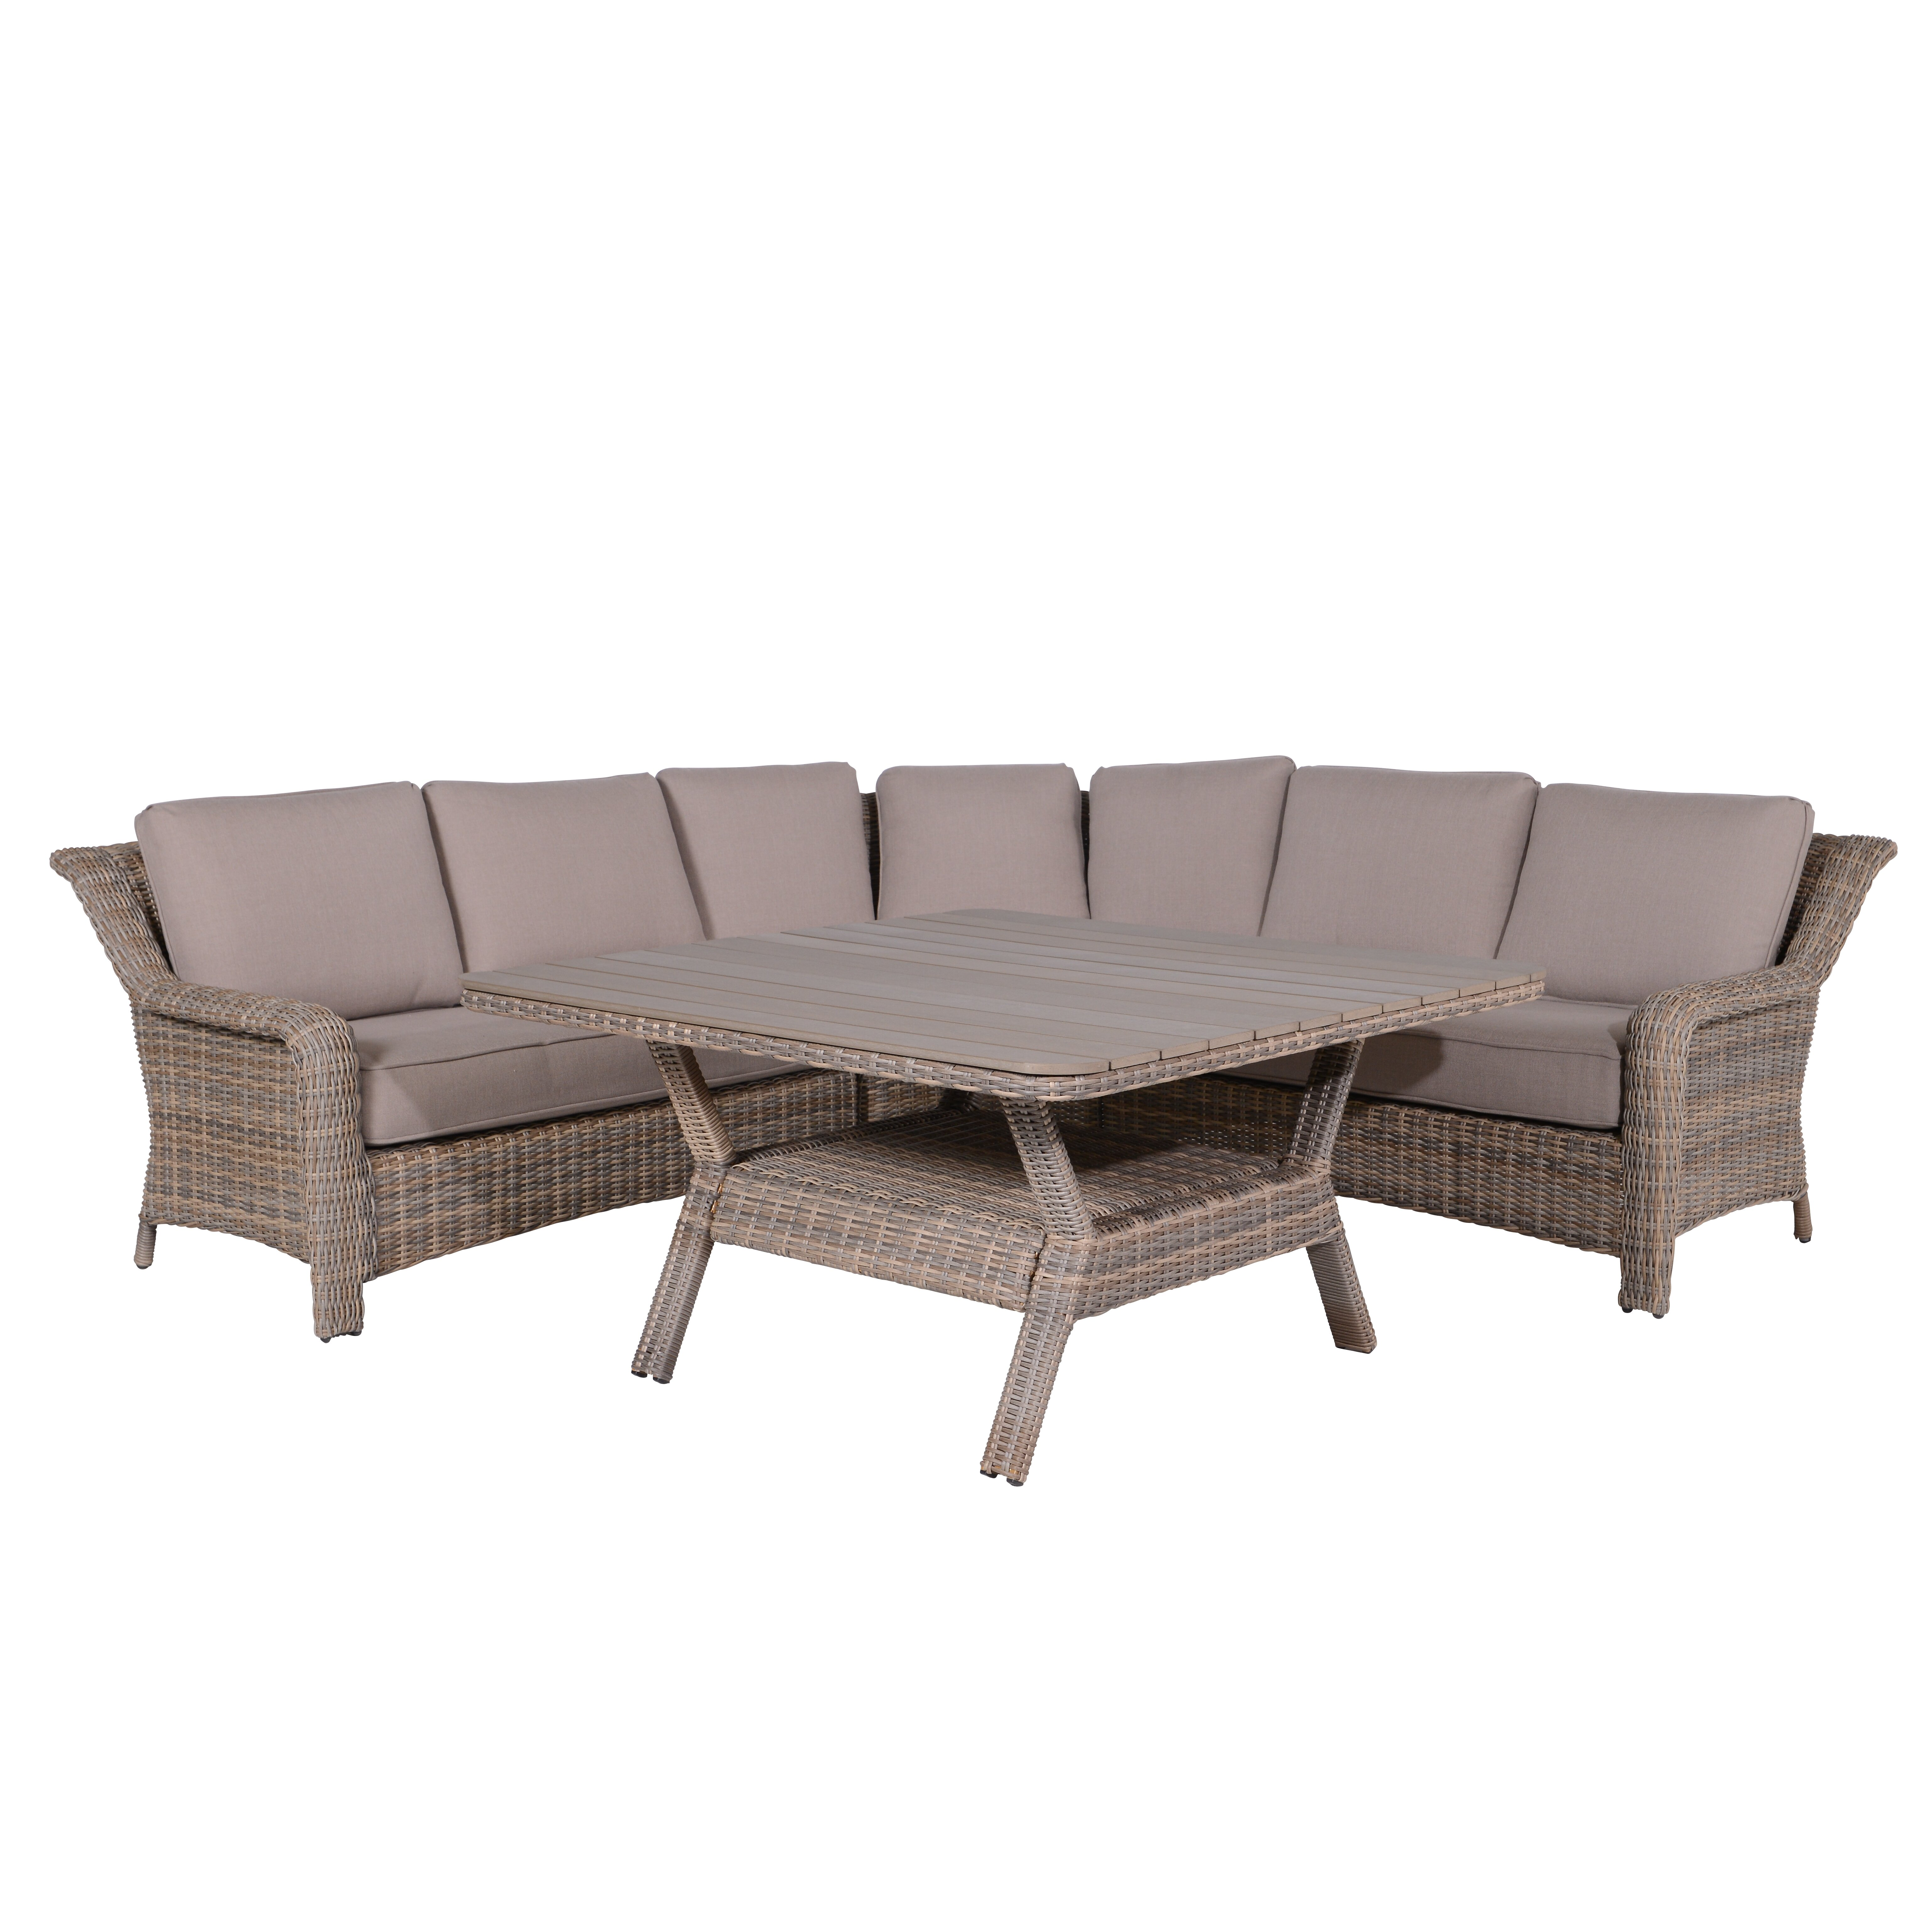 wildon home 7 sitzer essgruppe jade mit polster. Black Bedroom Furniture Sets. Home Design Ideas